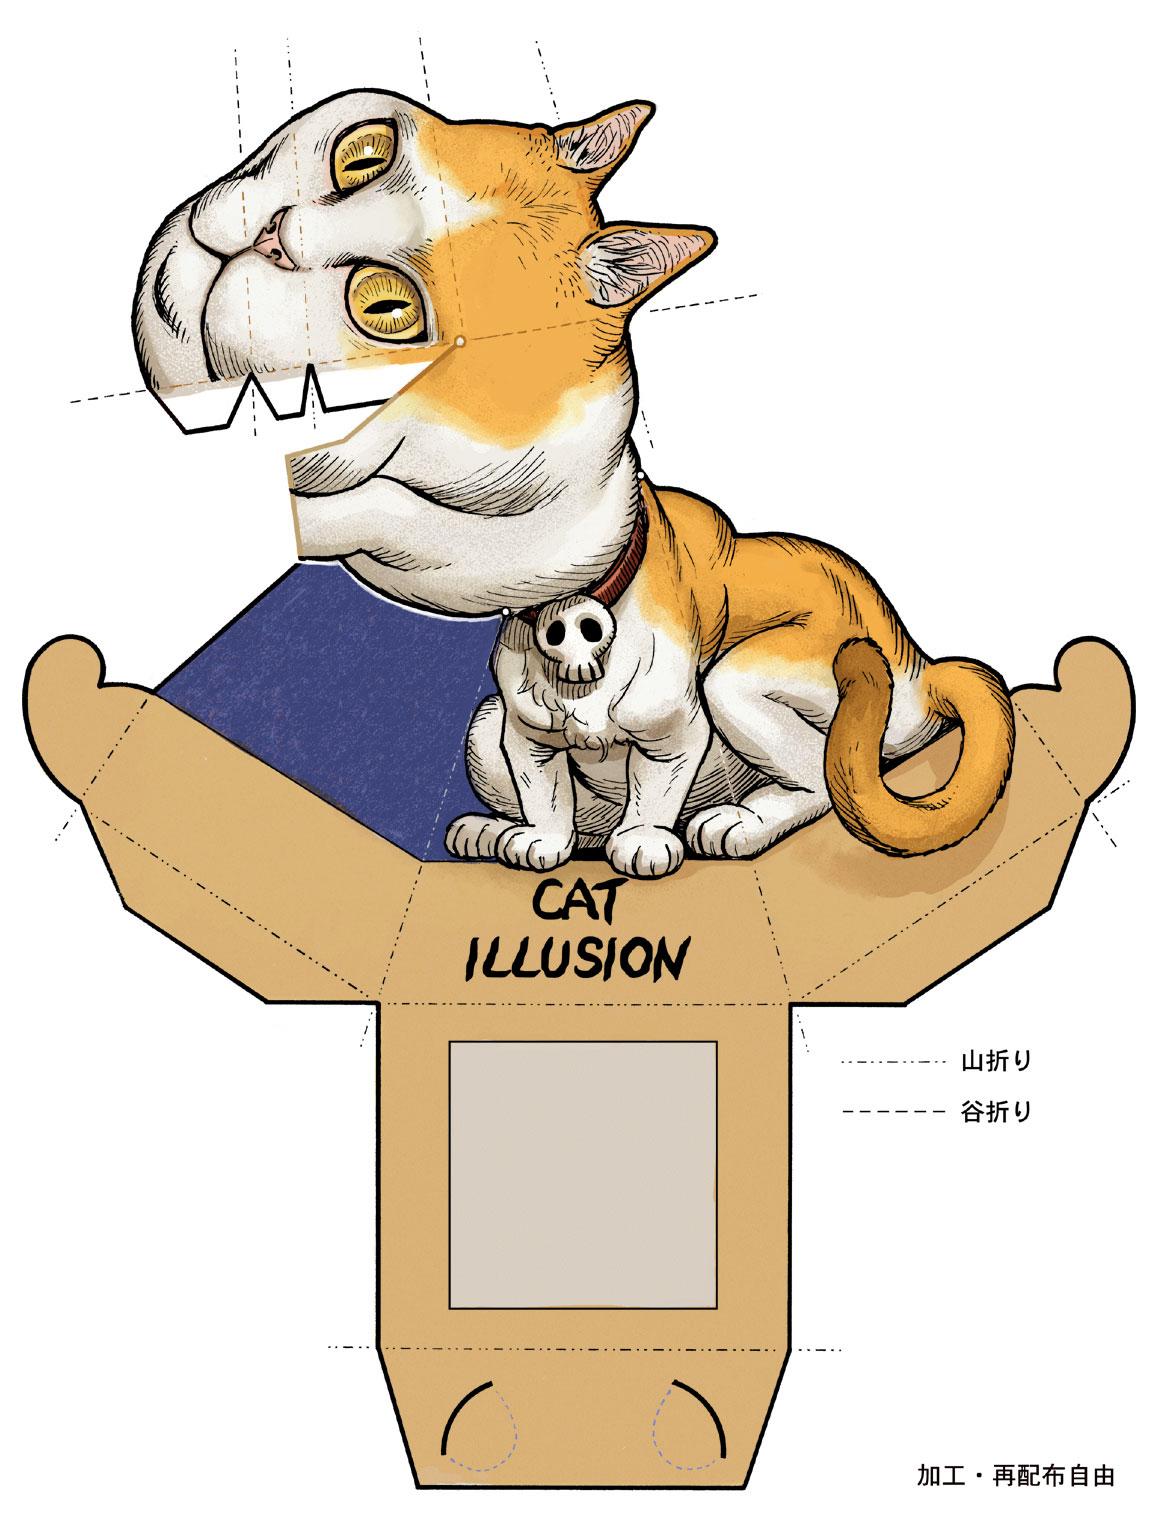 Illusion clipart dog Follow follow as the